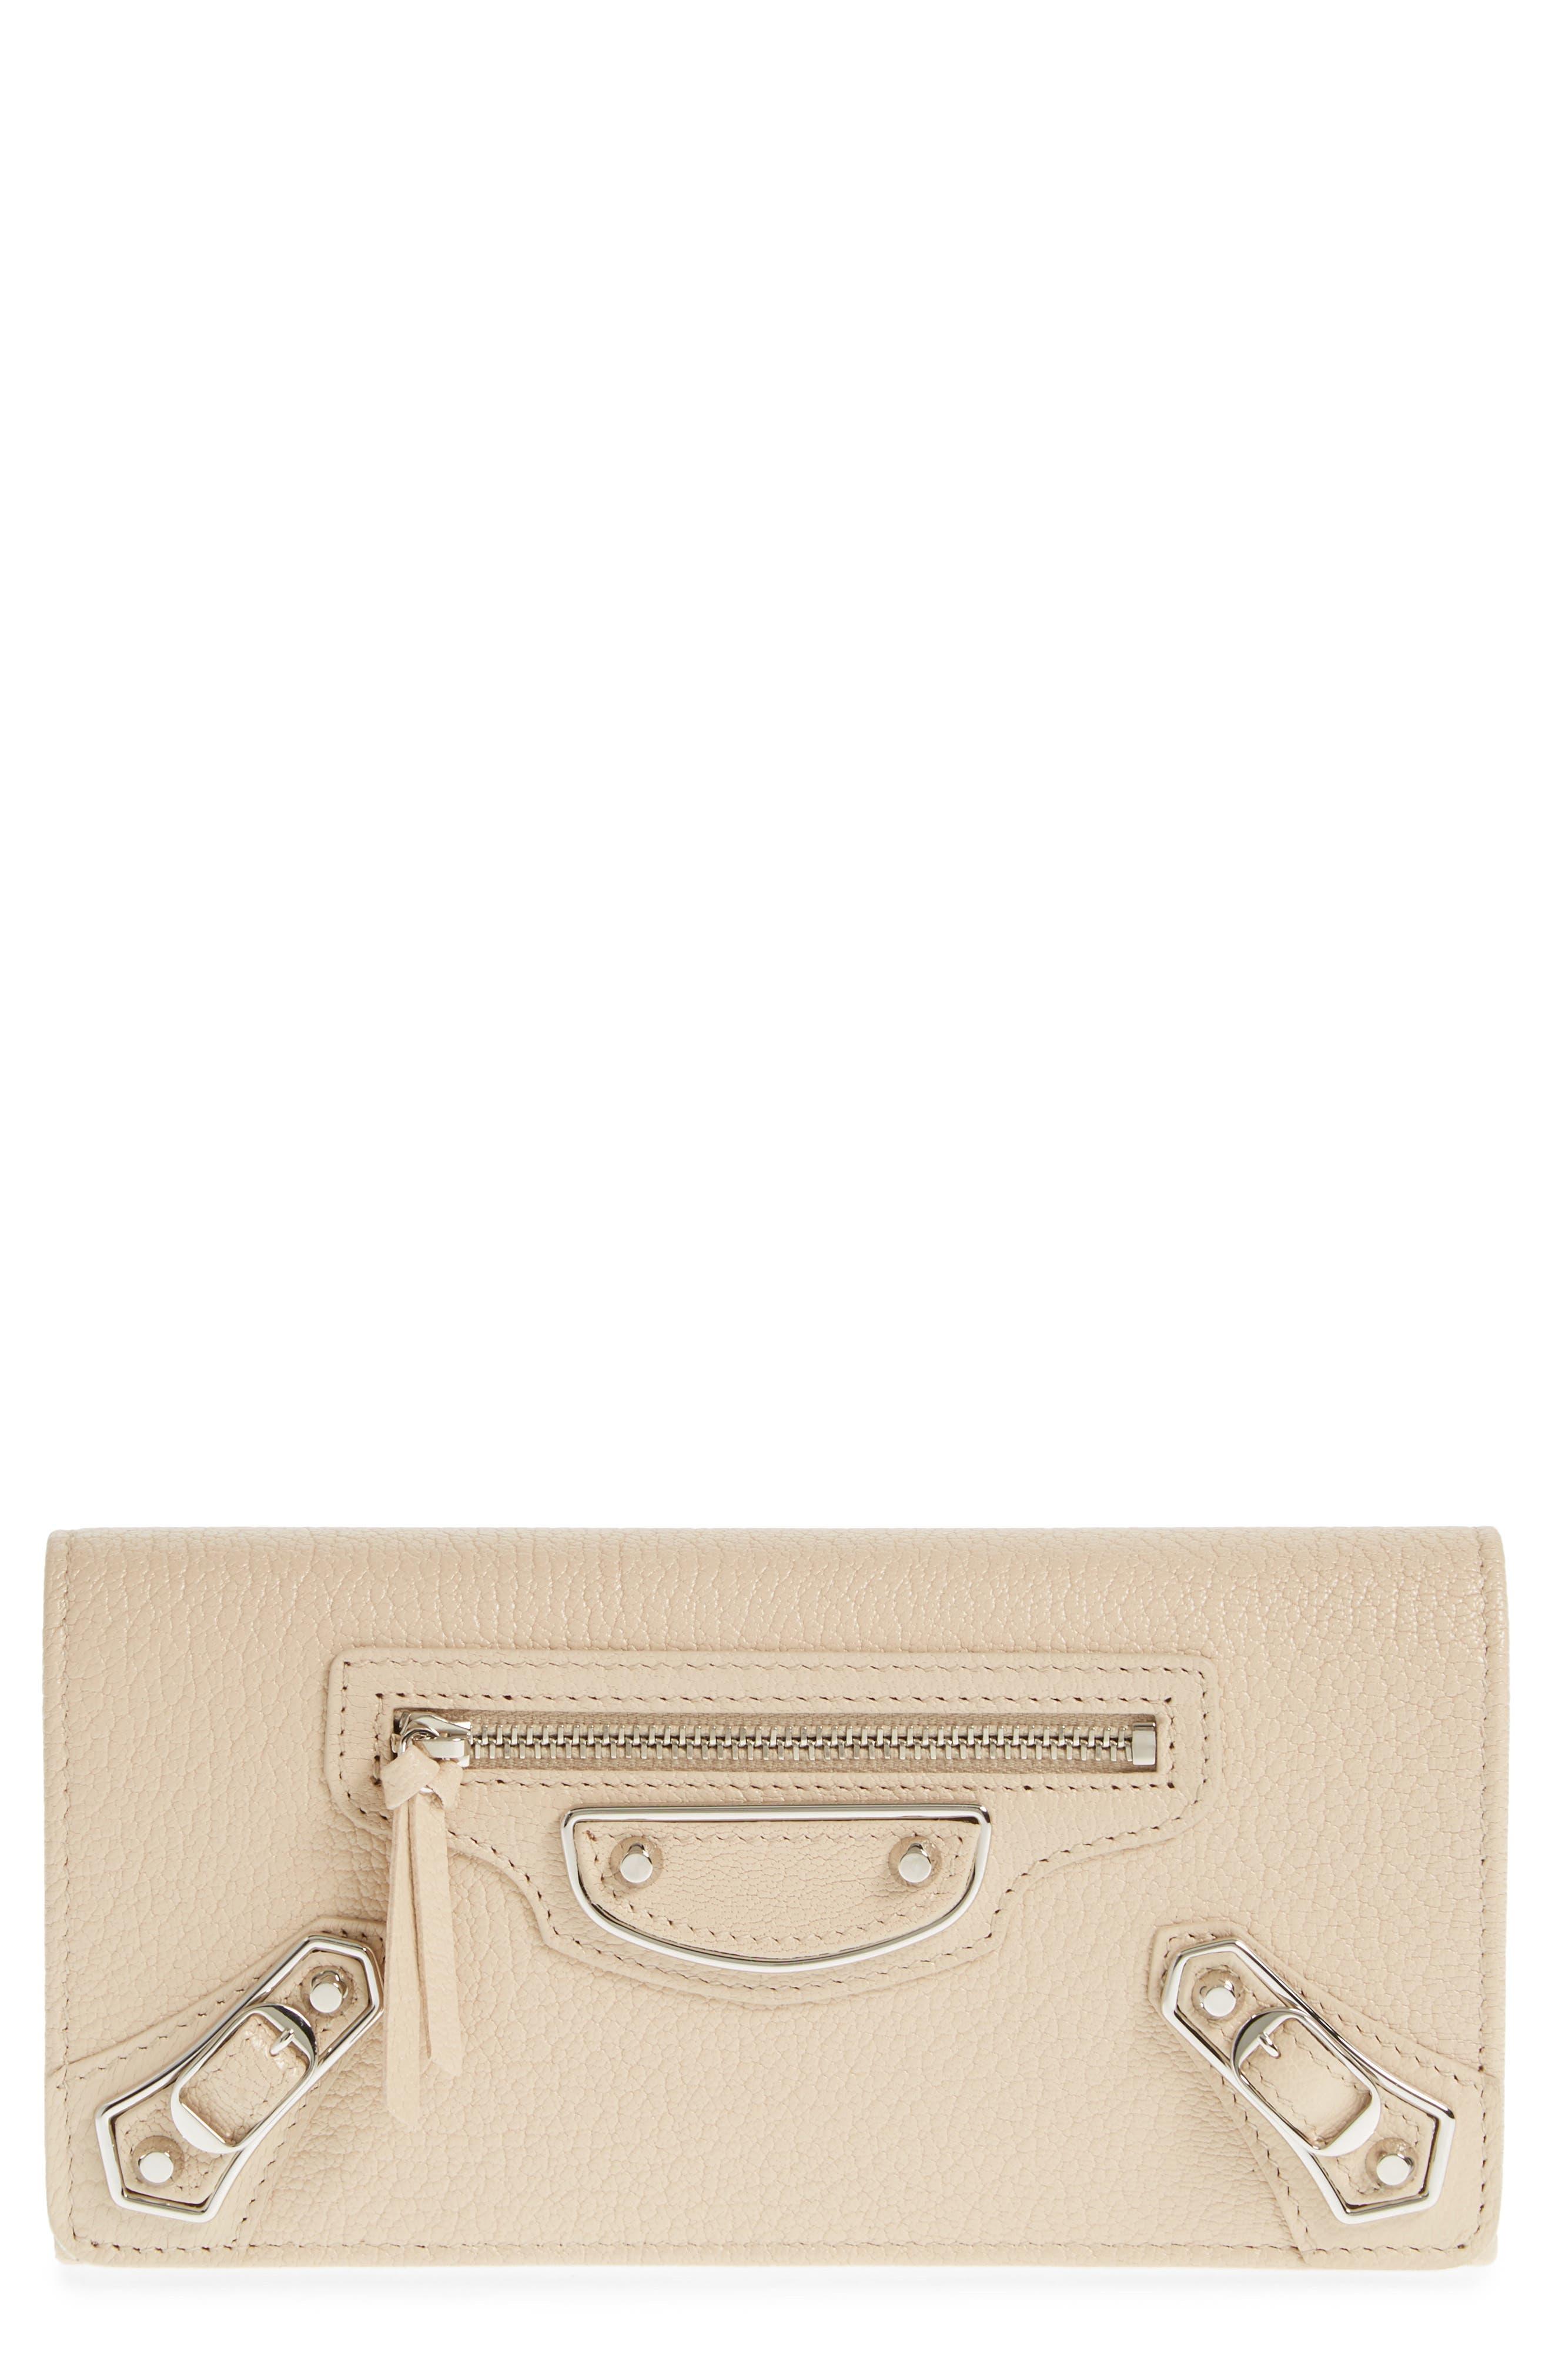 Alternate Image 1 Selected - Balenciaga Metallic Edge Money Leather Wallet